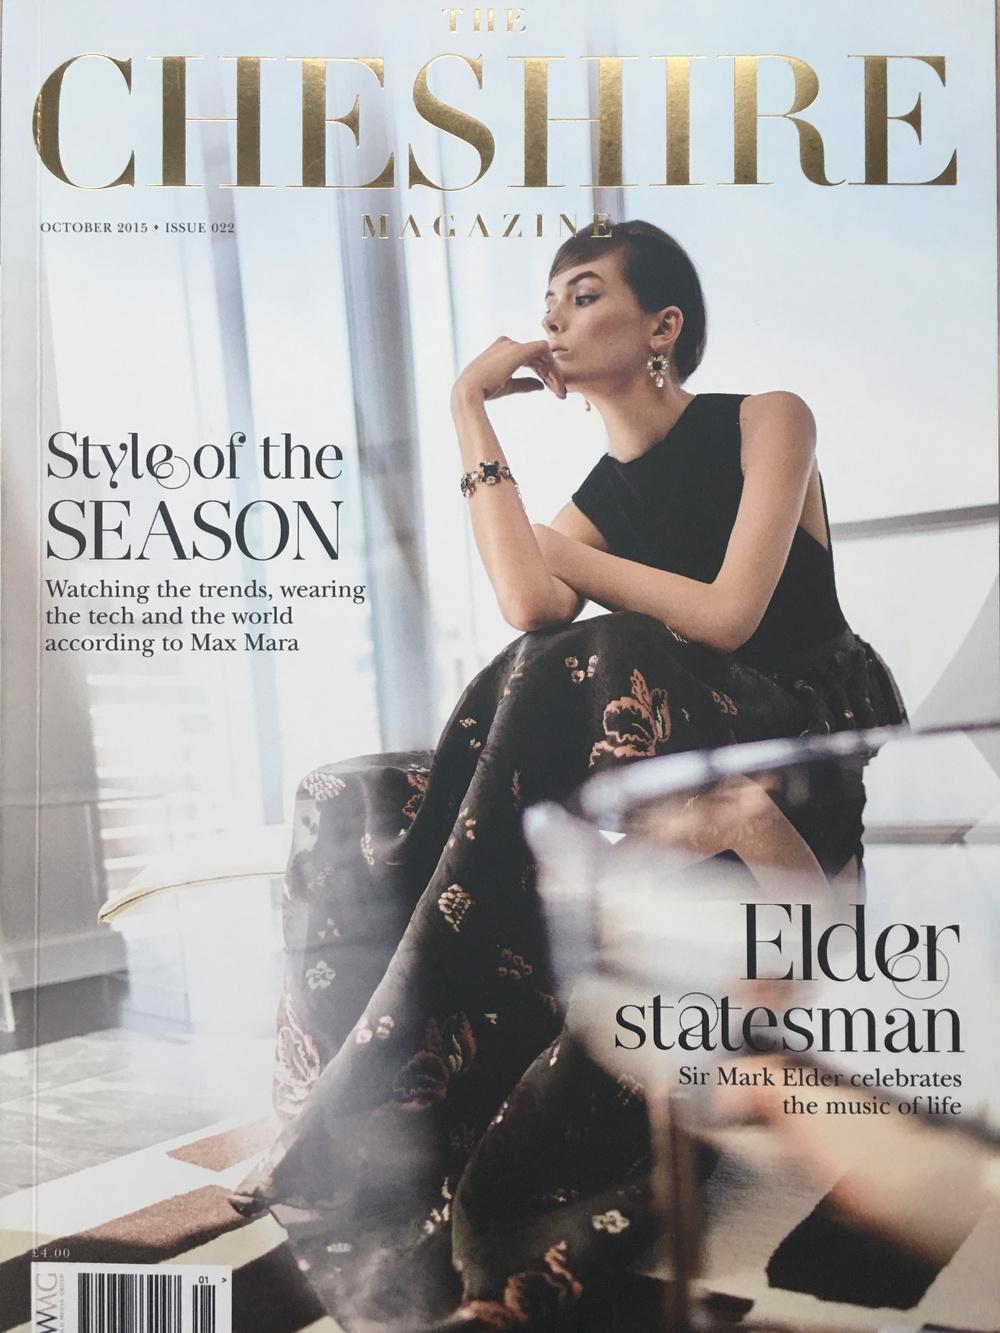 The Cheshire Magazine October 2015